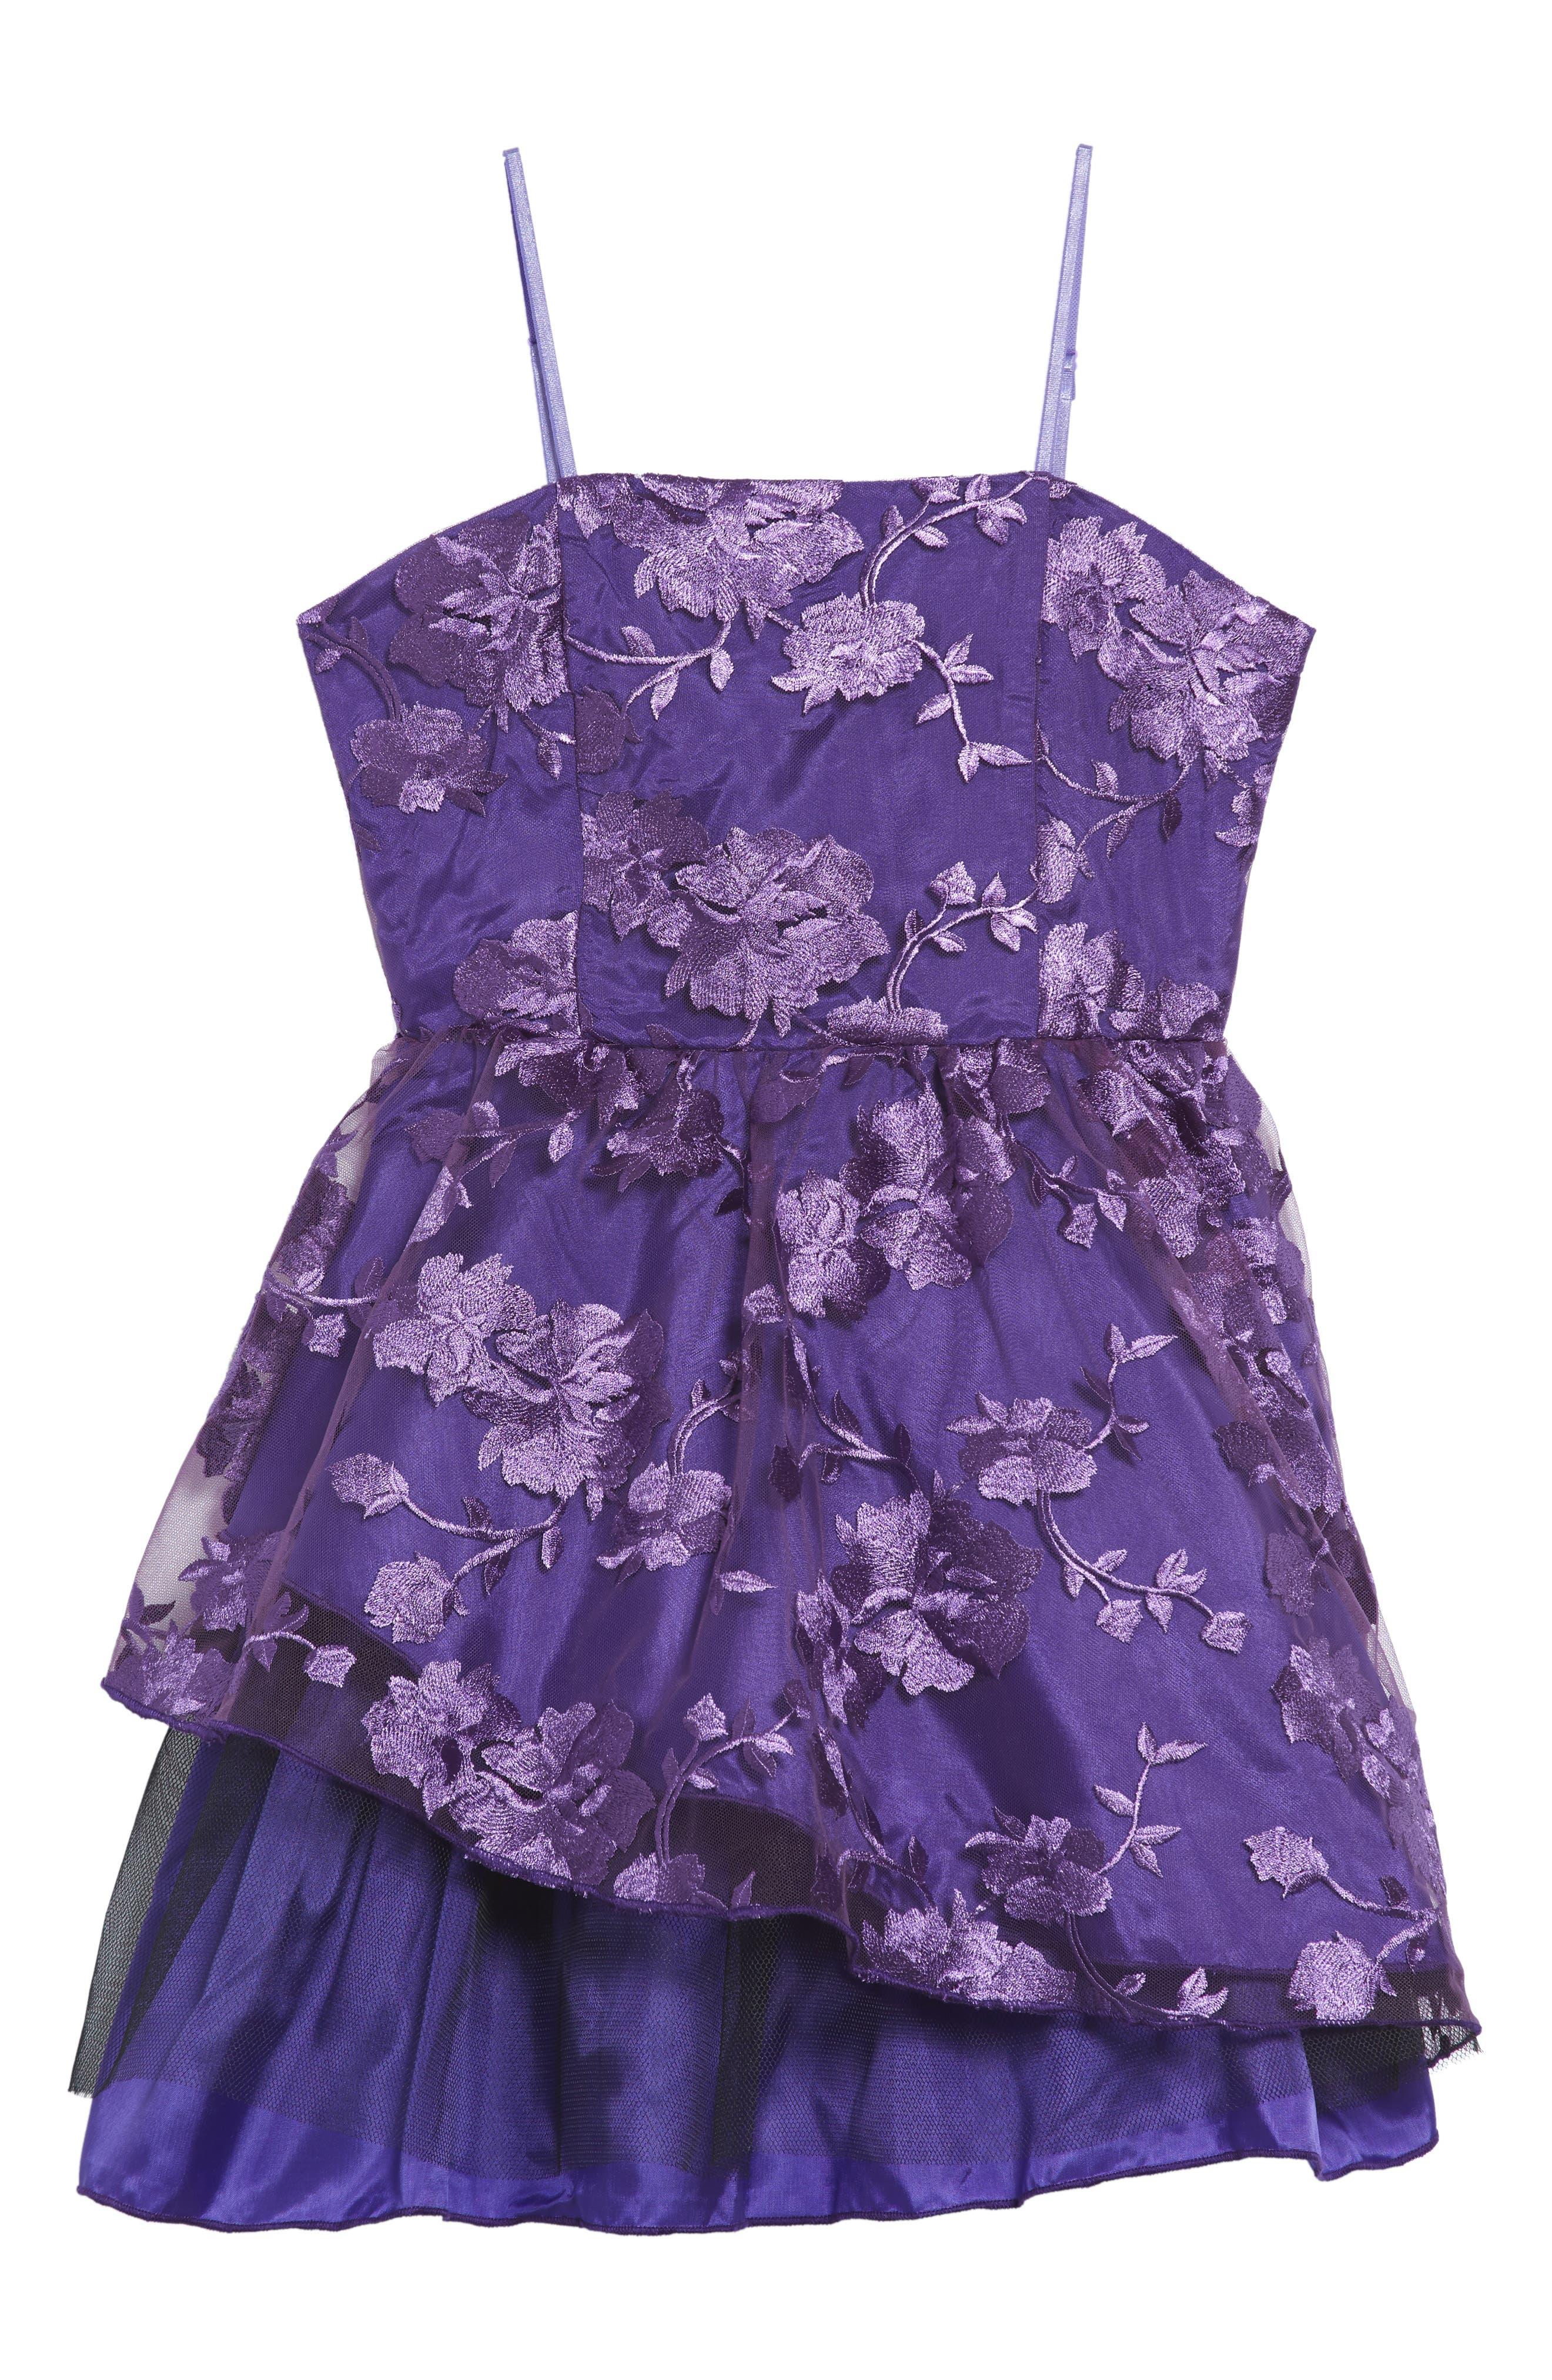 Floral Mesh Sleeveless Dress,                             Main thumbnail 1, color,                             500